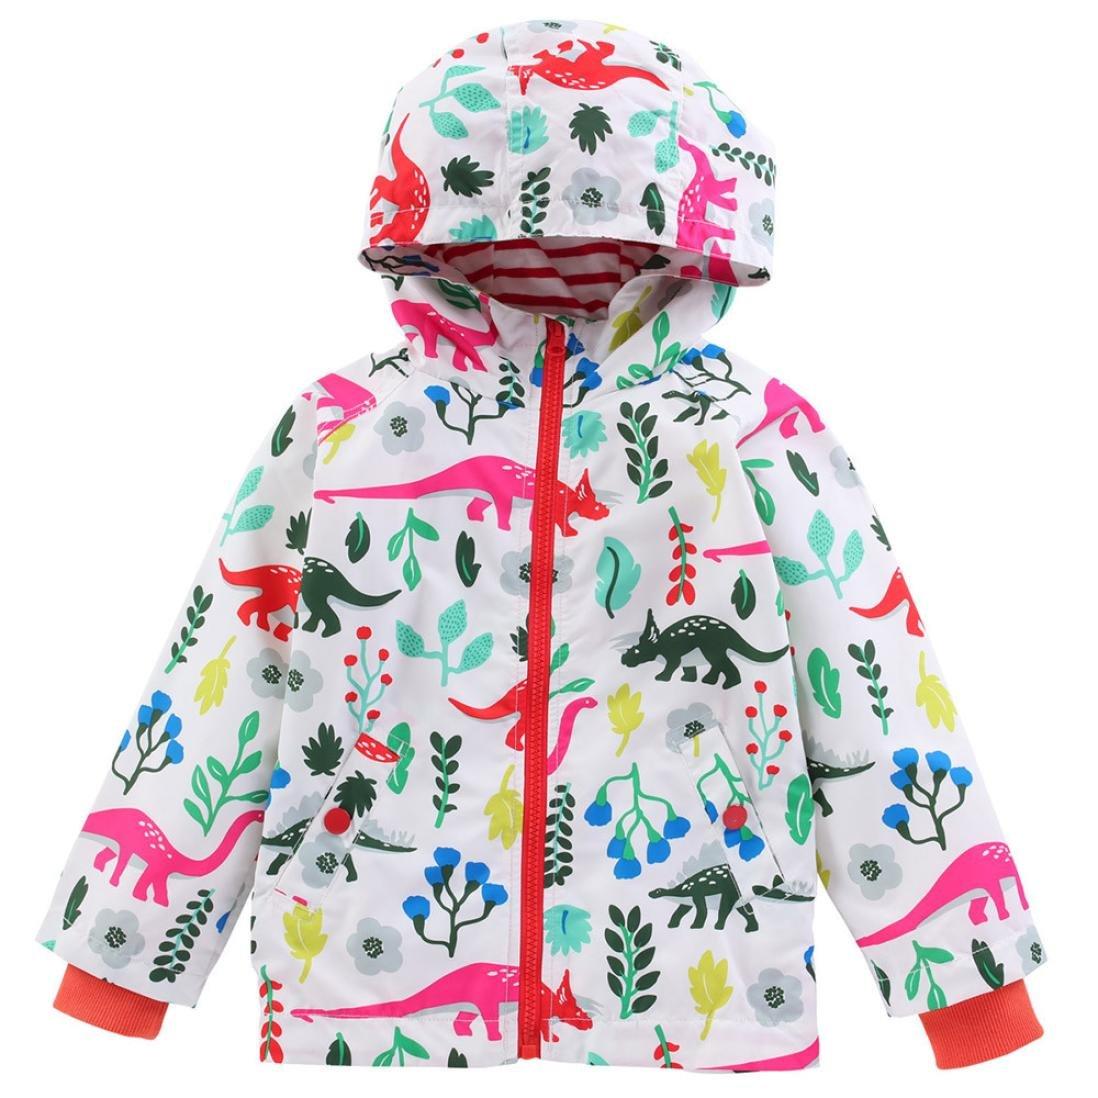 Fineser TM Baby Girls Jacket Autumn Winter Dinosaur Pattern Cardigan Kids Outwear Coat